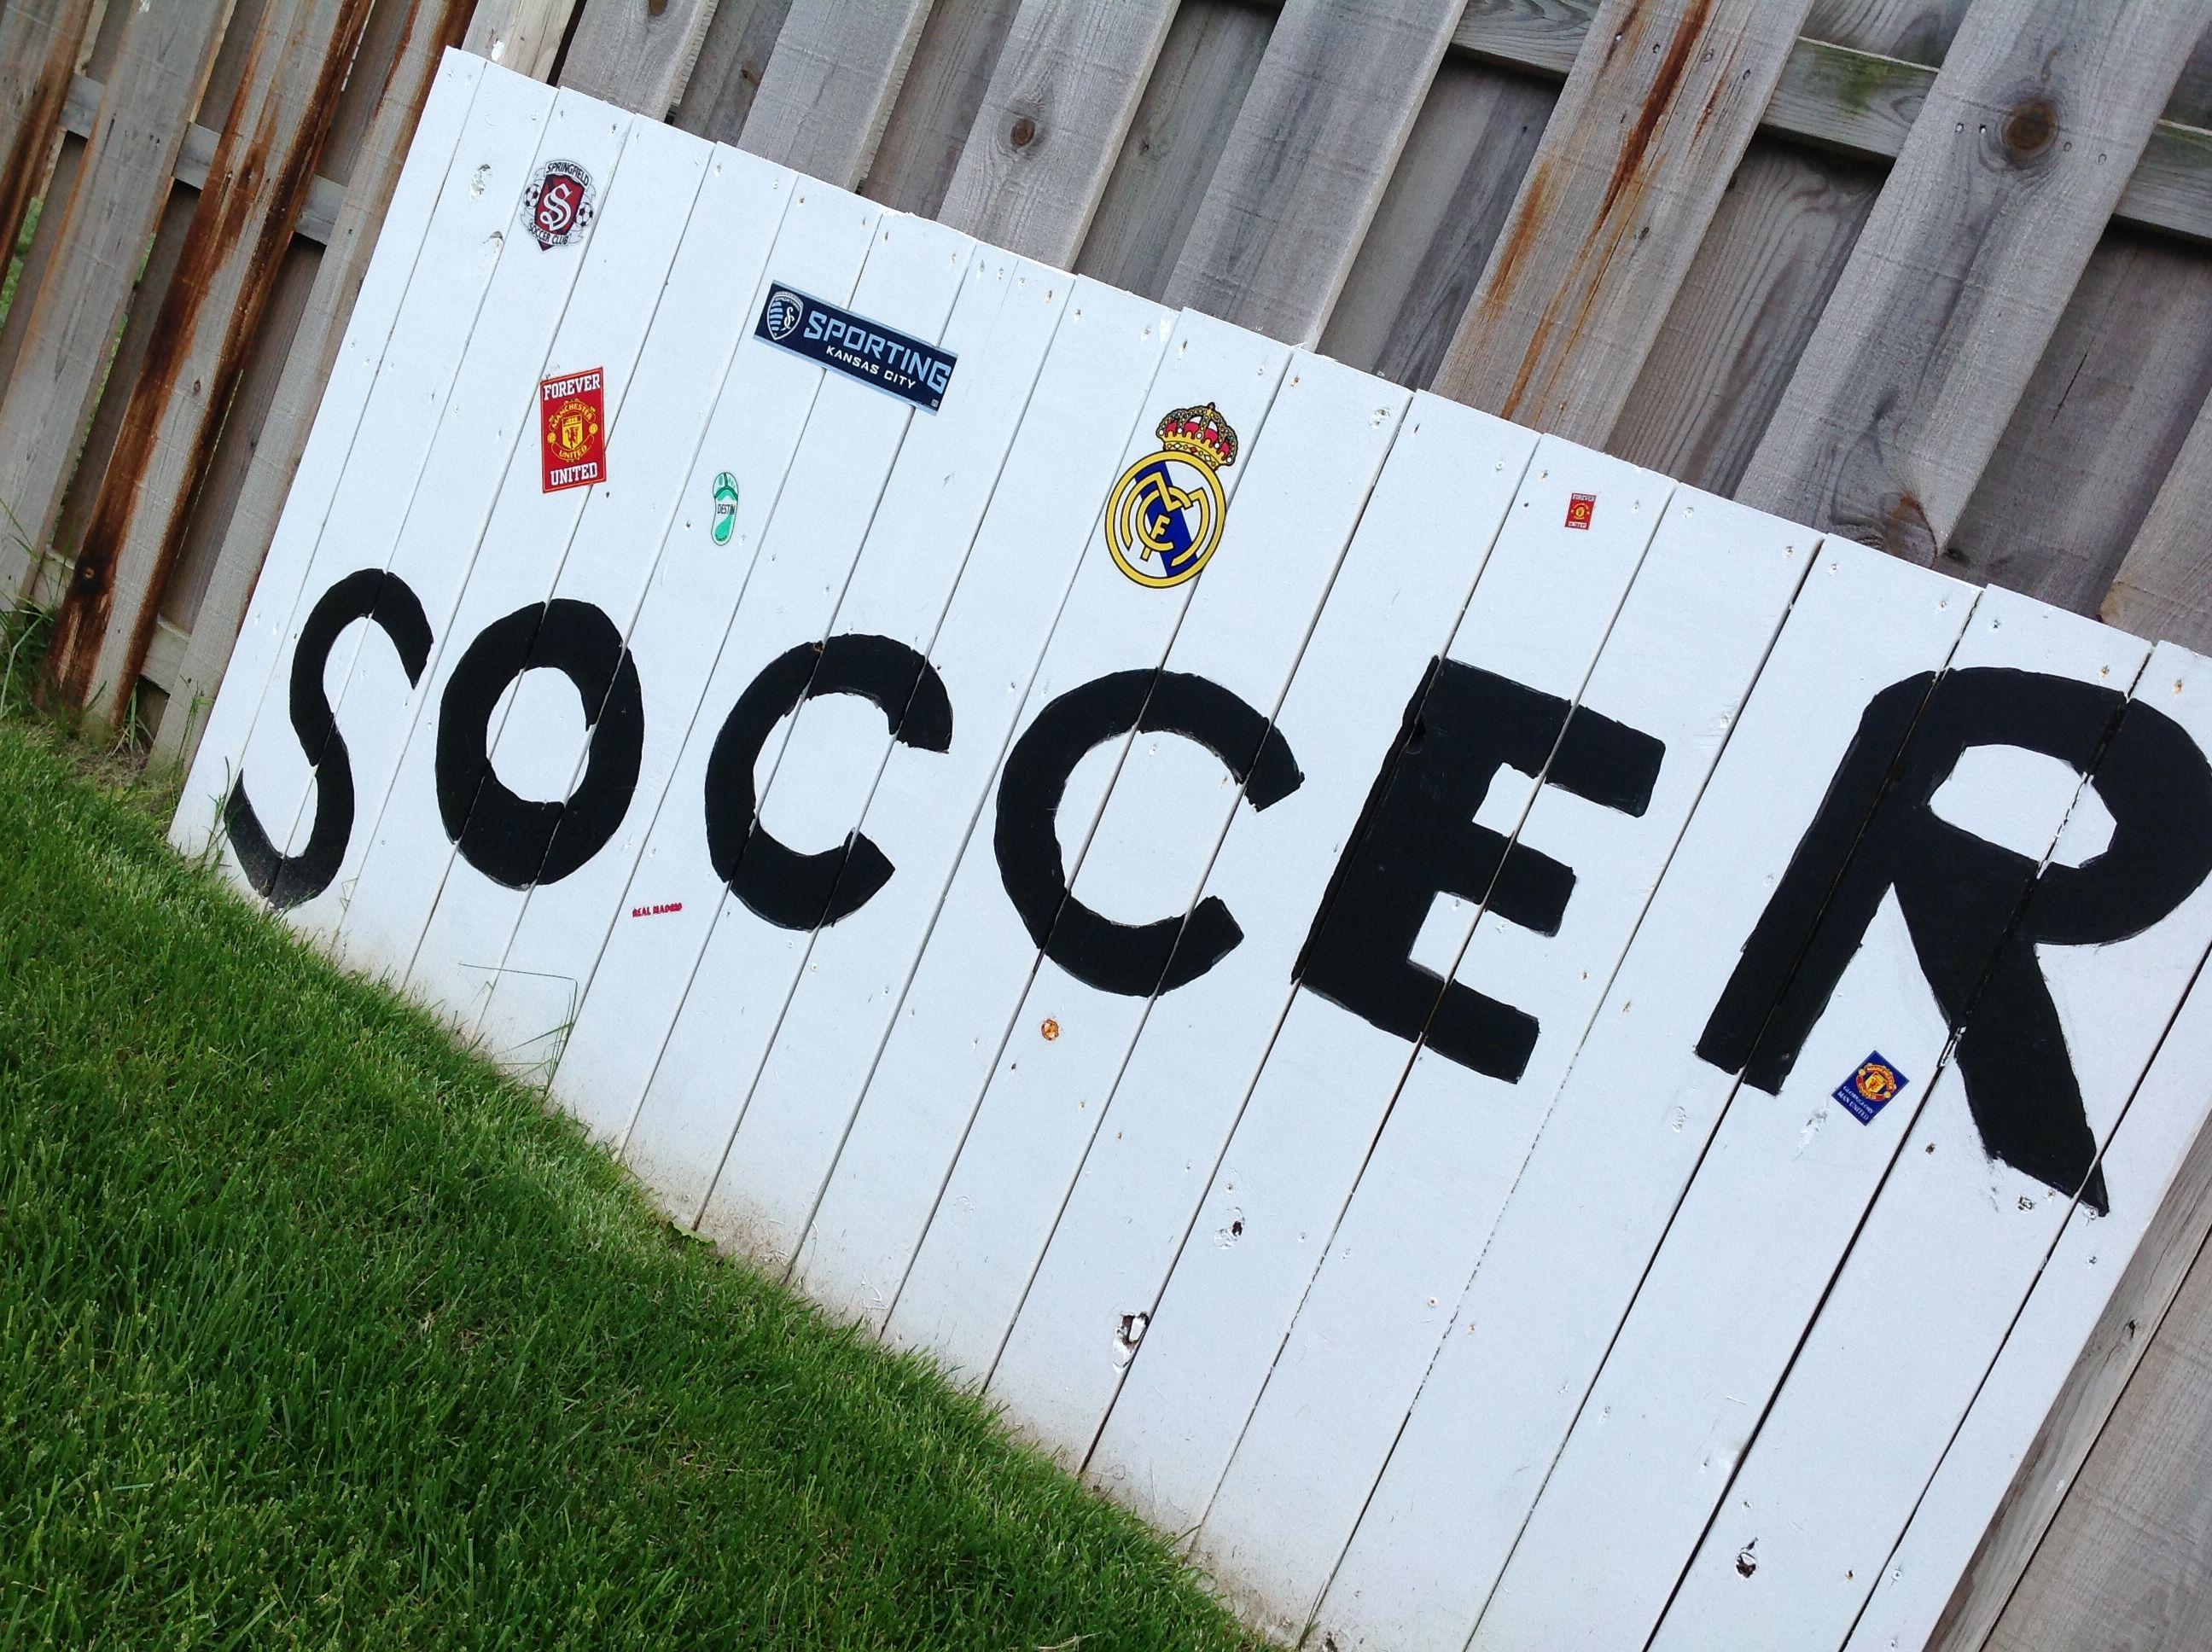 backyard soccer kickboard soccer pinterest backyard